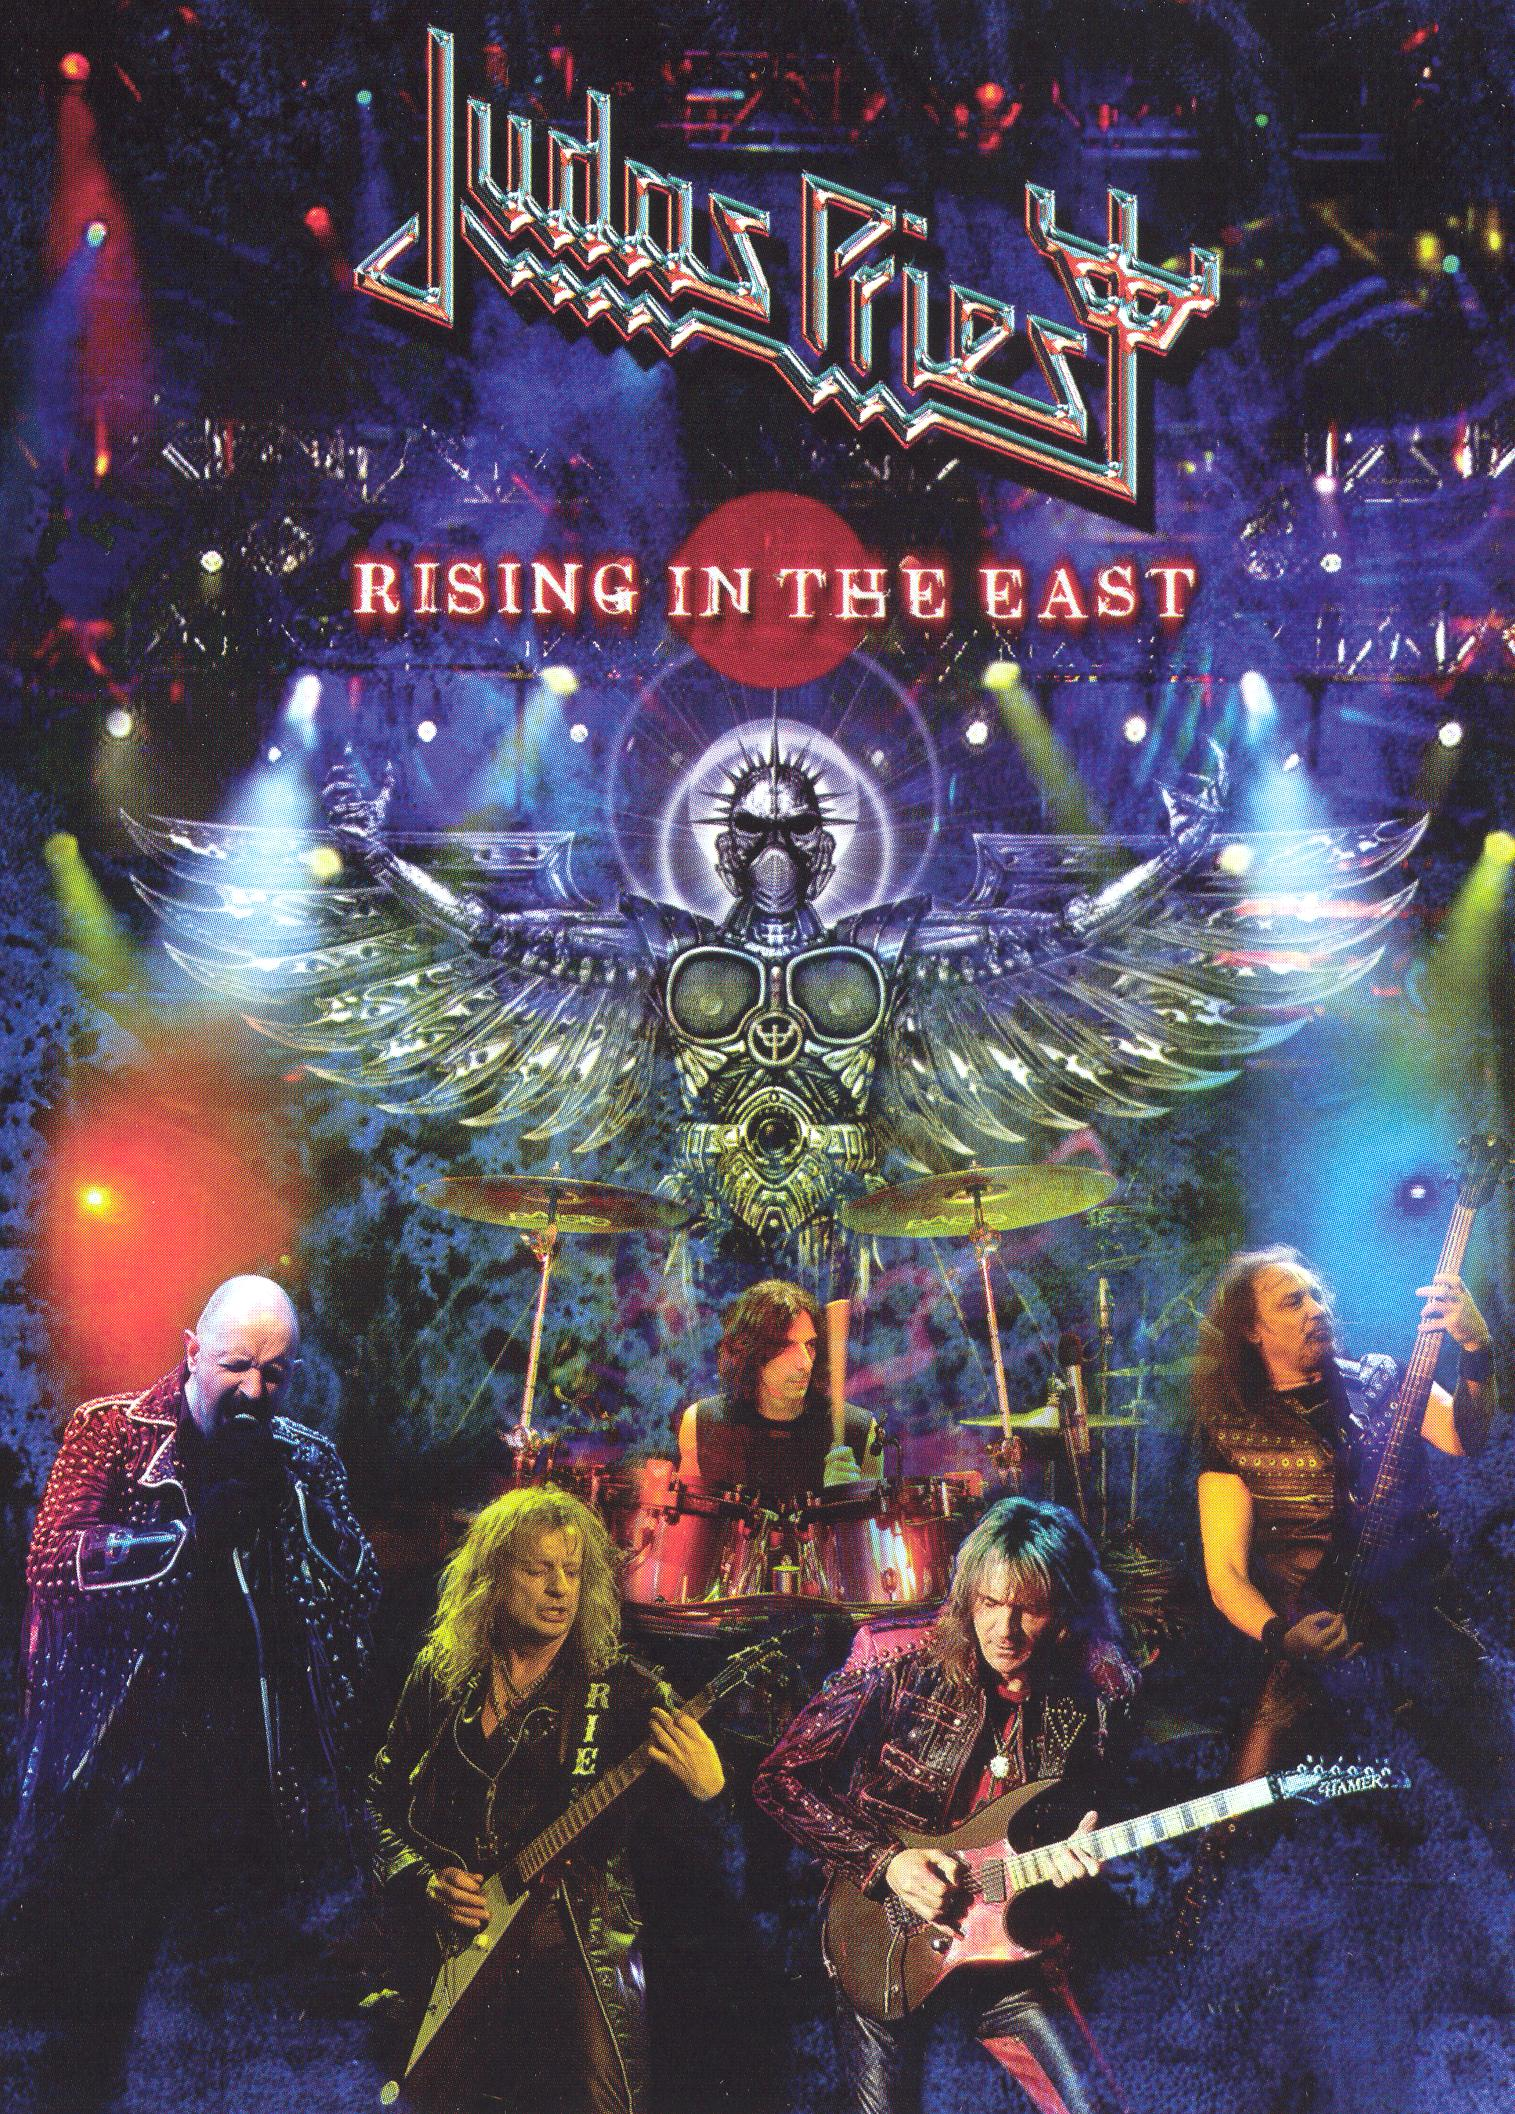 Judas Priest: Rising in the East